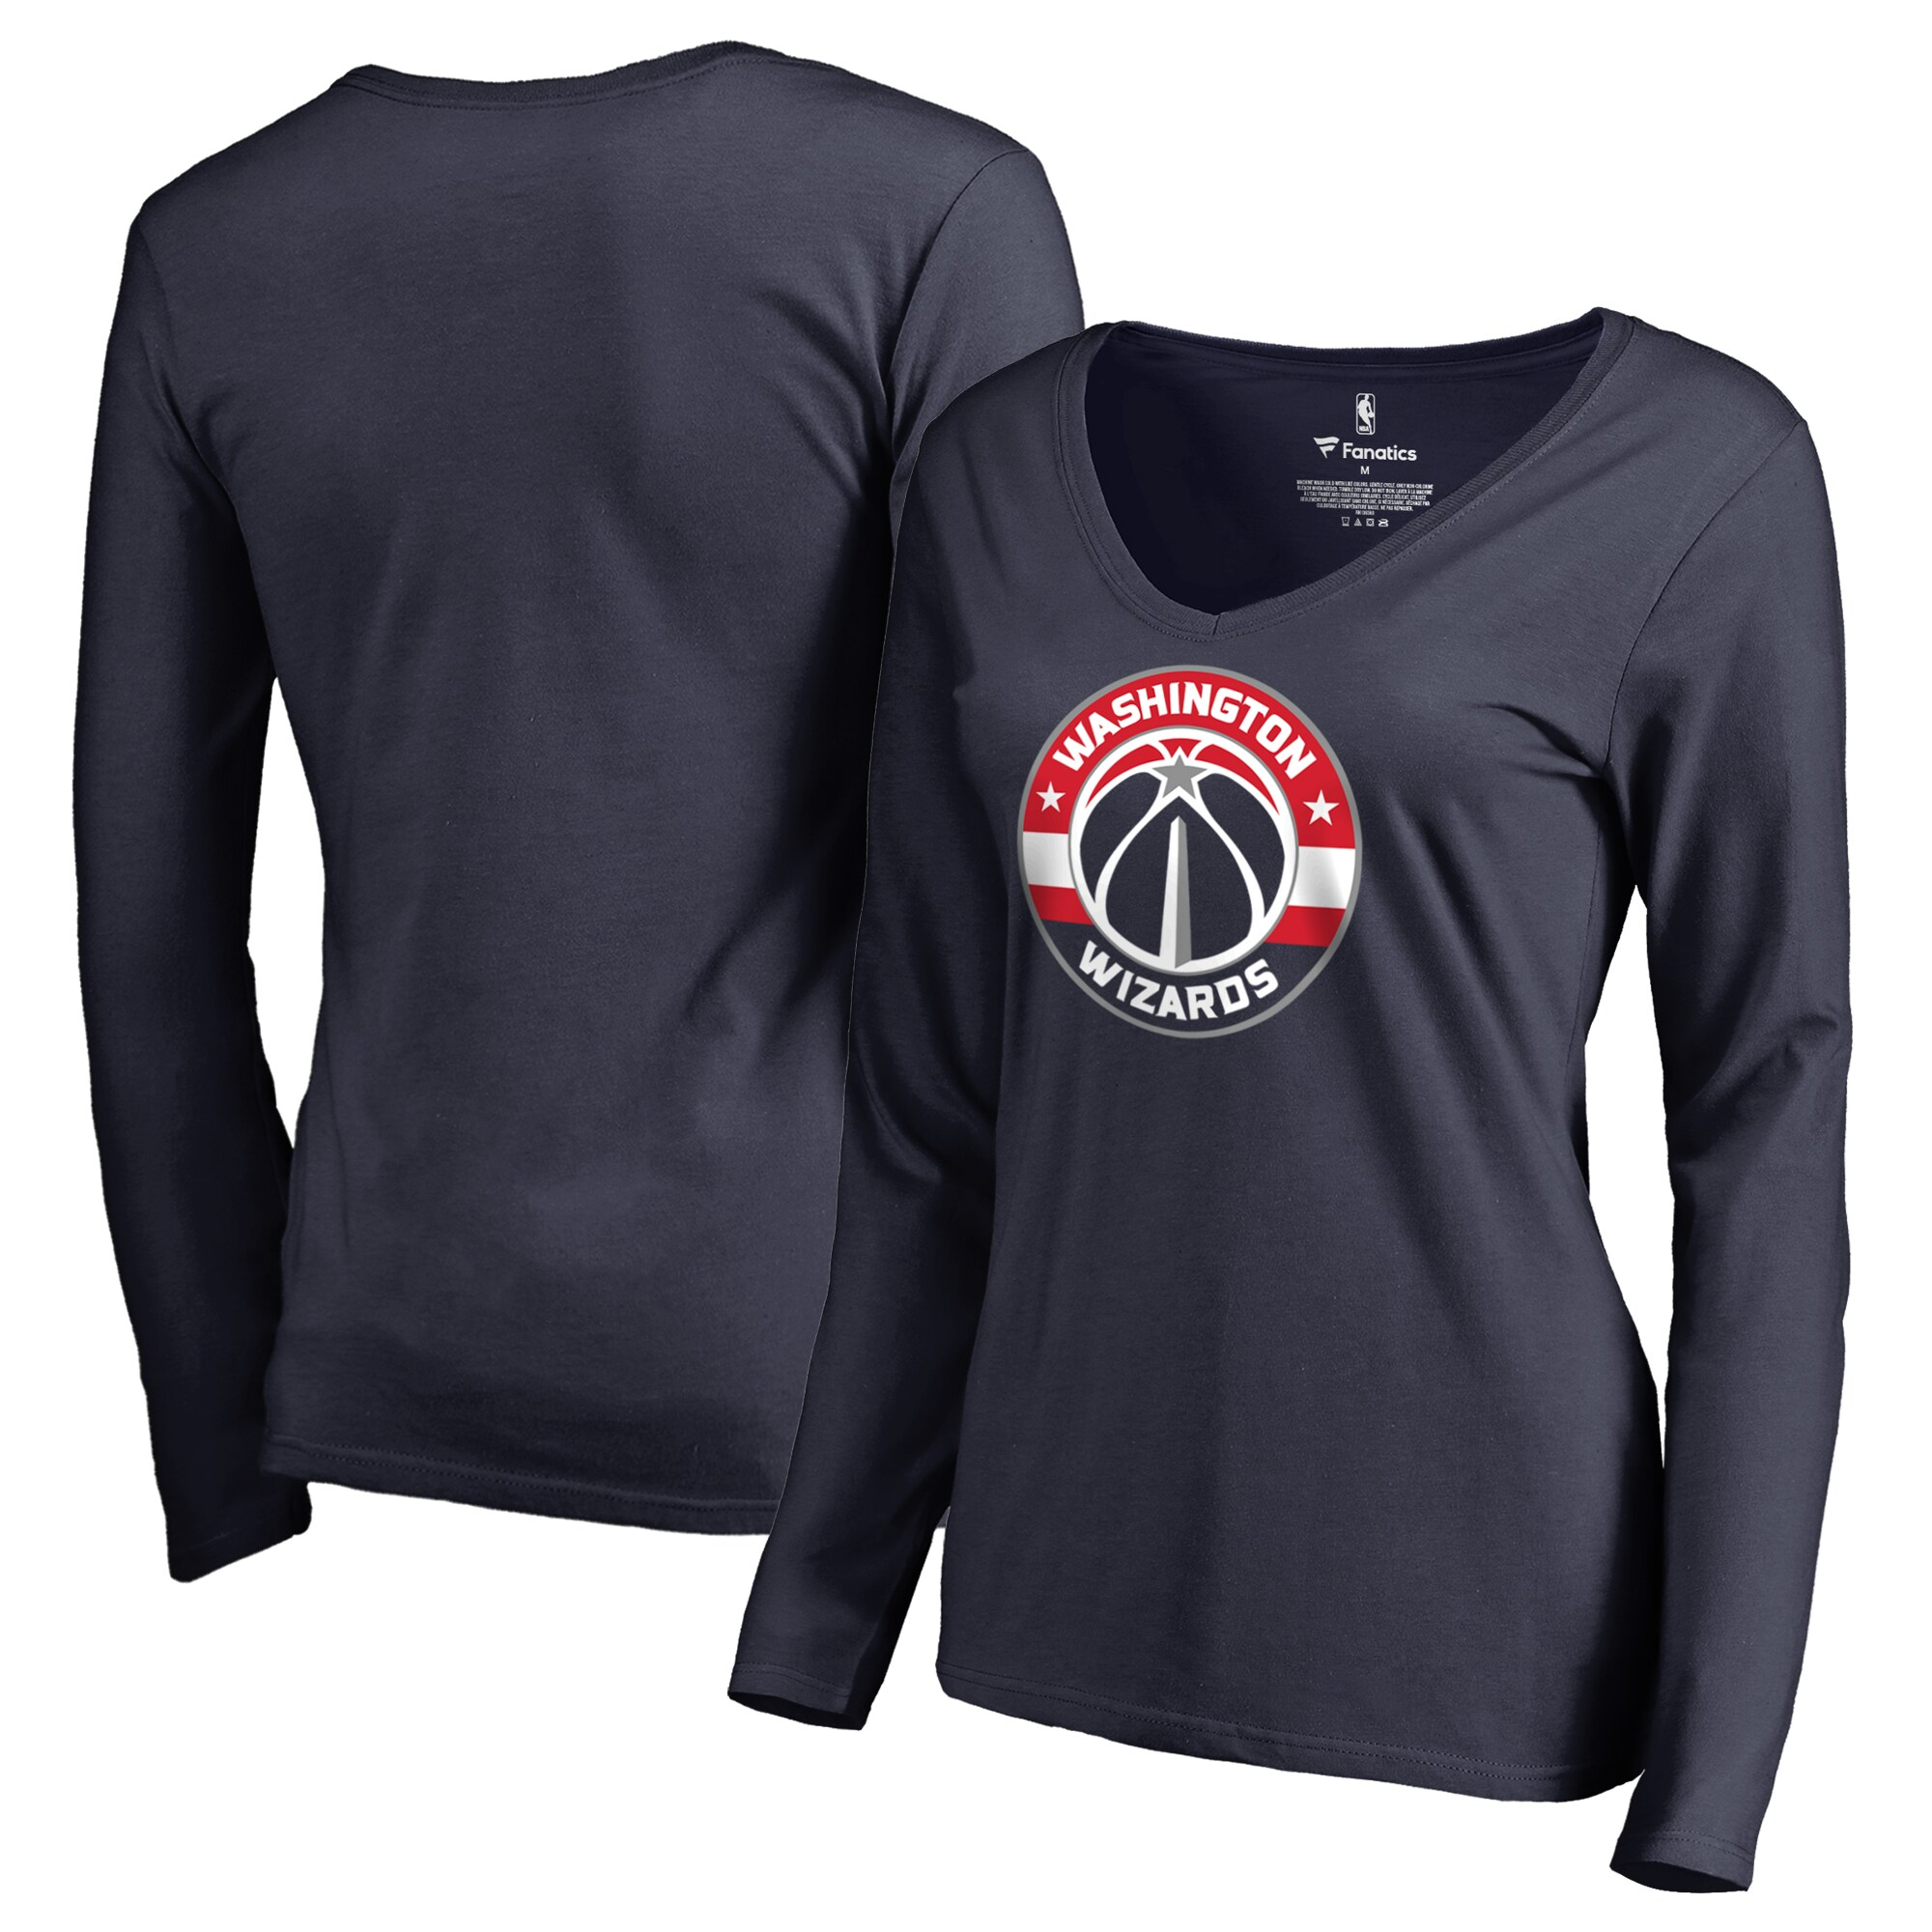 Washington Wizards Fanatics Branded Women's Primary Logo V-Neck Long Sleeve T-Shirt - Navy